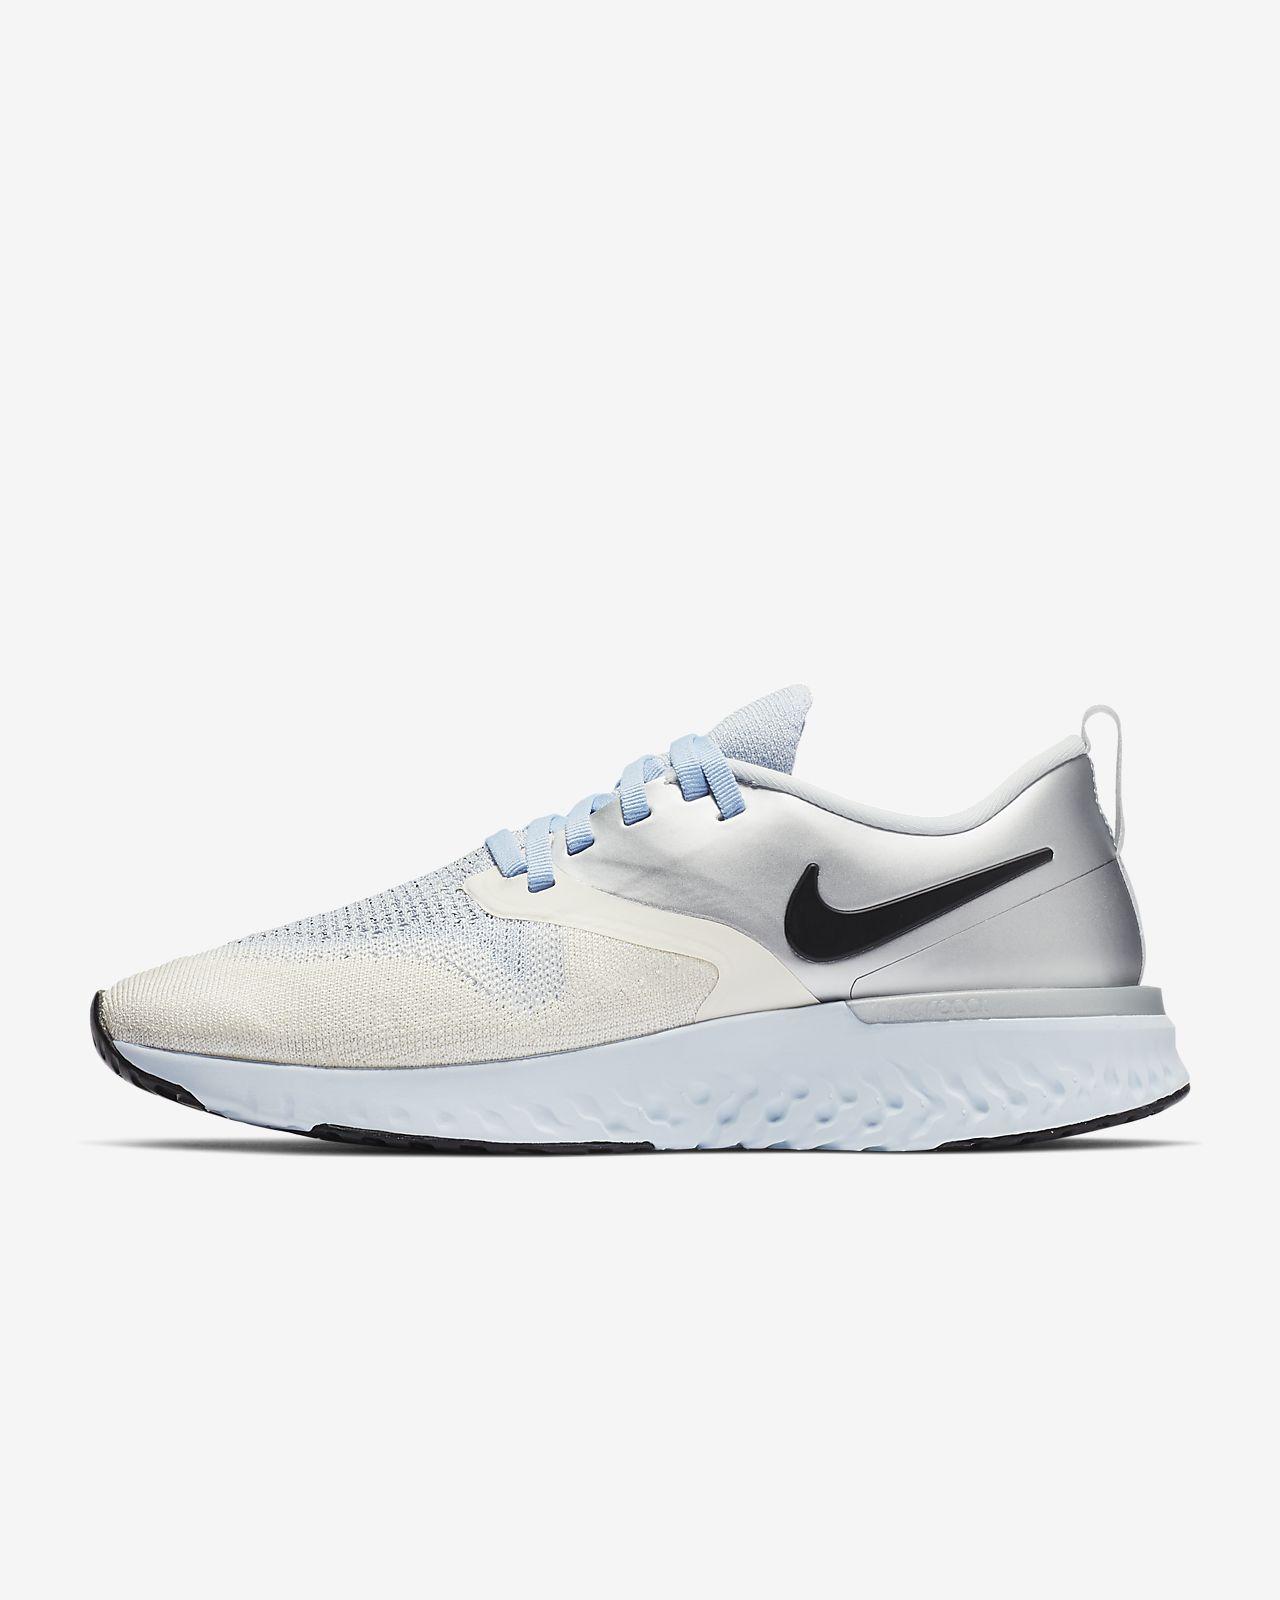 8a902ad4e8 Nike Odyssey React Flyknit 2 Premium női futócipő. Nike.com HU